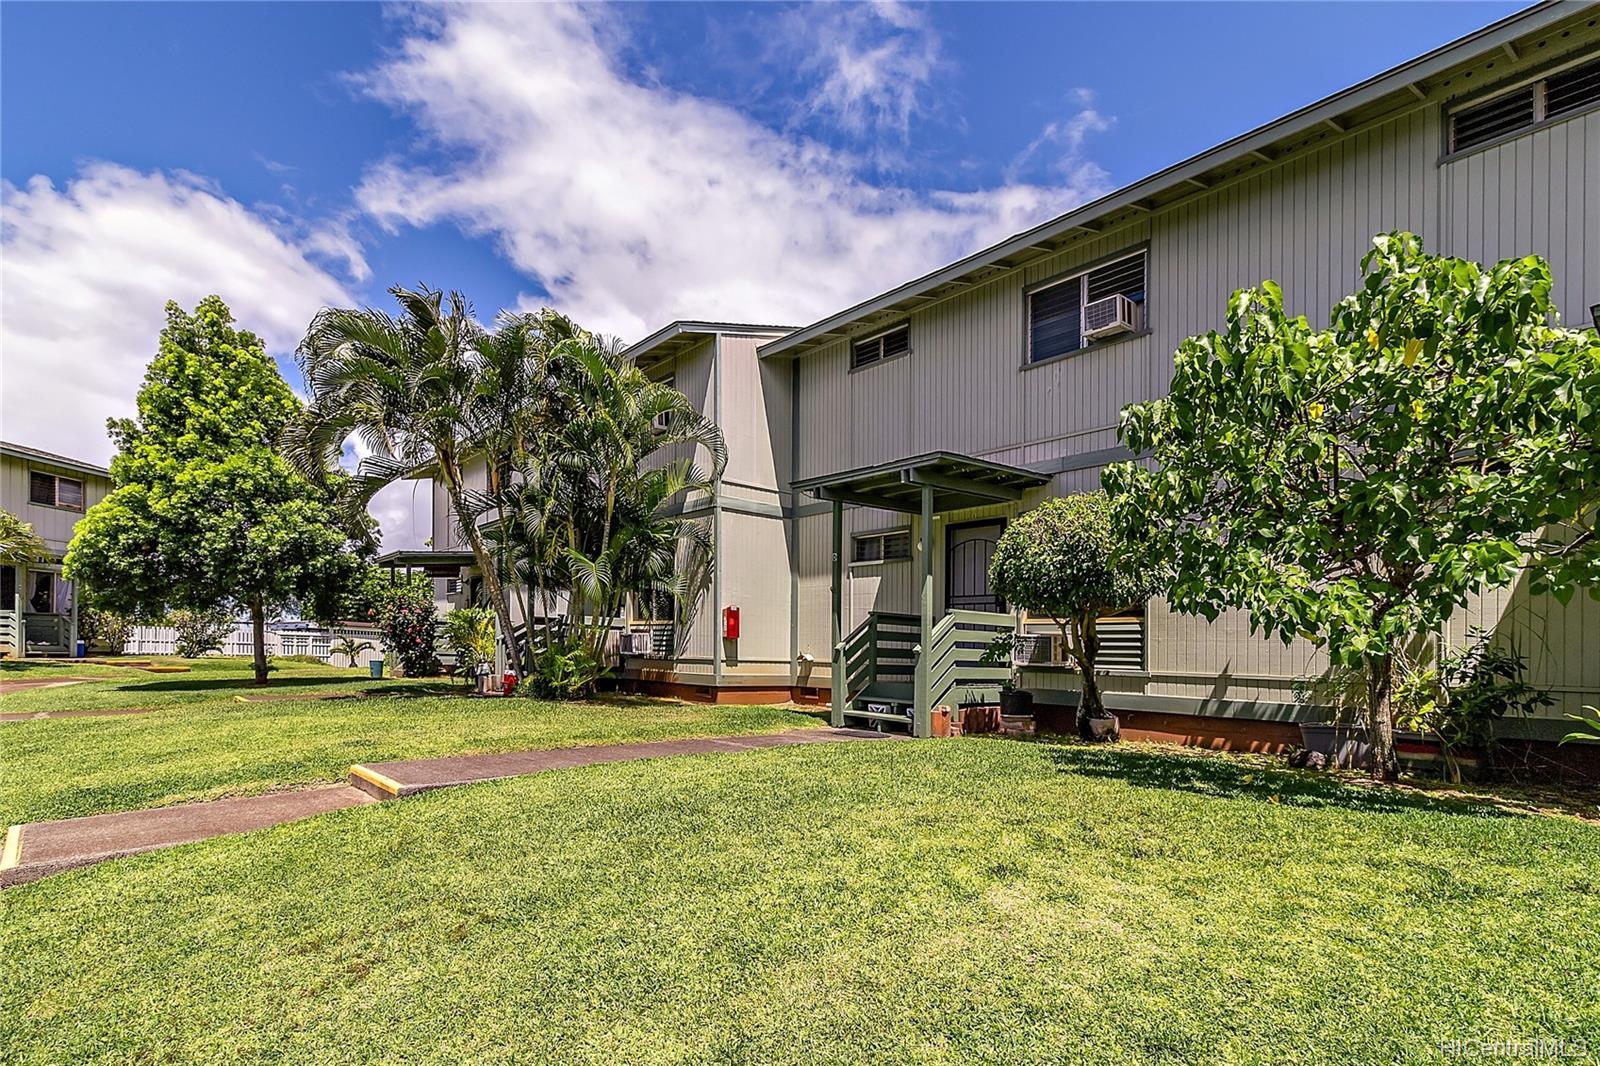 98-1438 Kaahumanu Street townhouse # D, Pearl City, Hawaii - photo 14 of 14